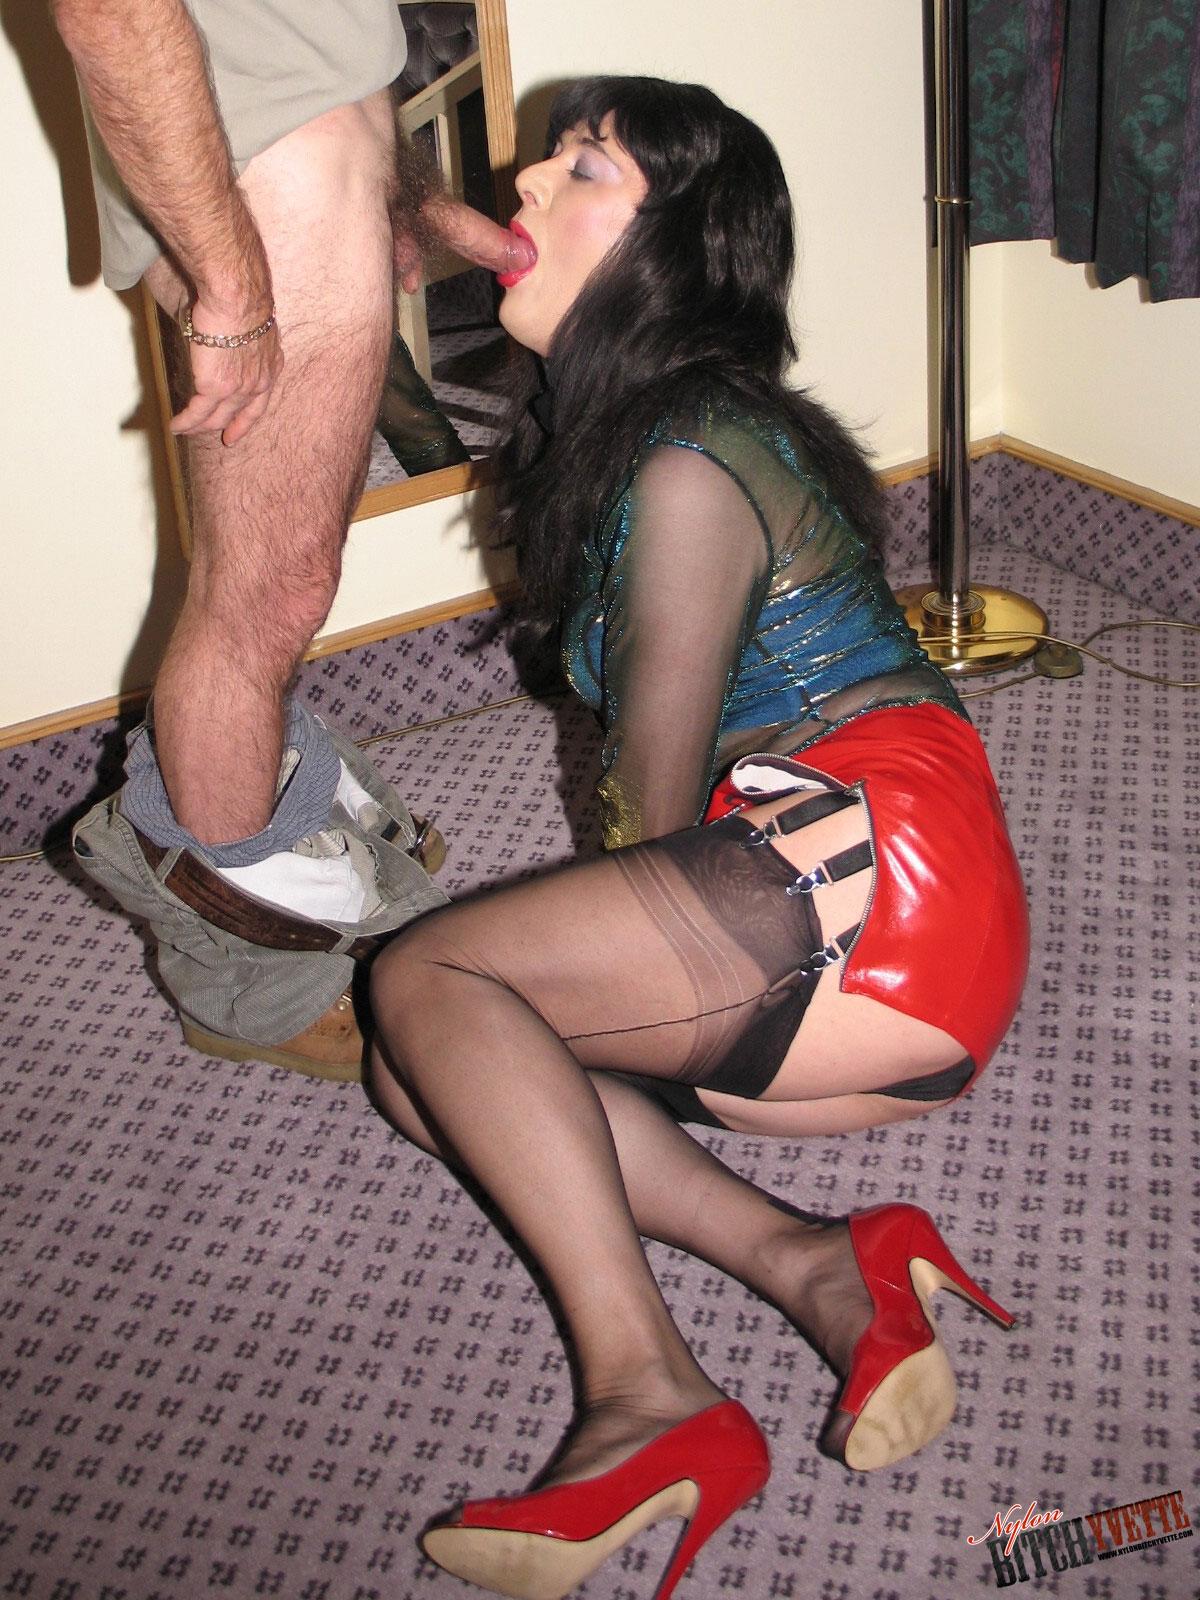 Crossdresser Doing Handjob Wearing Tight Pants